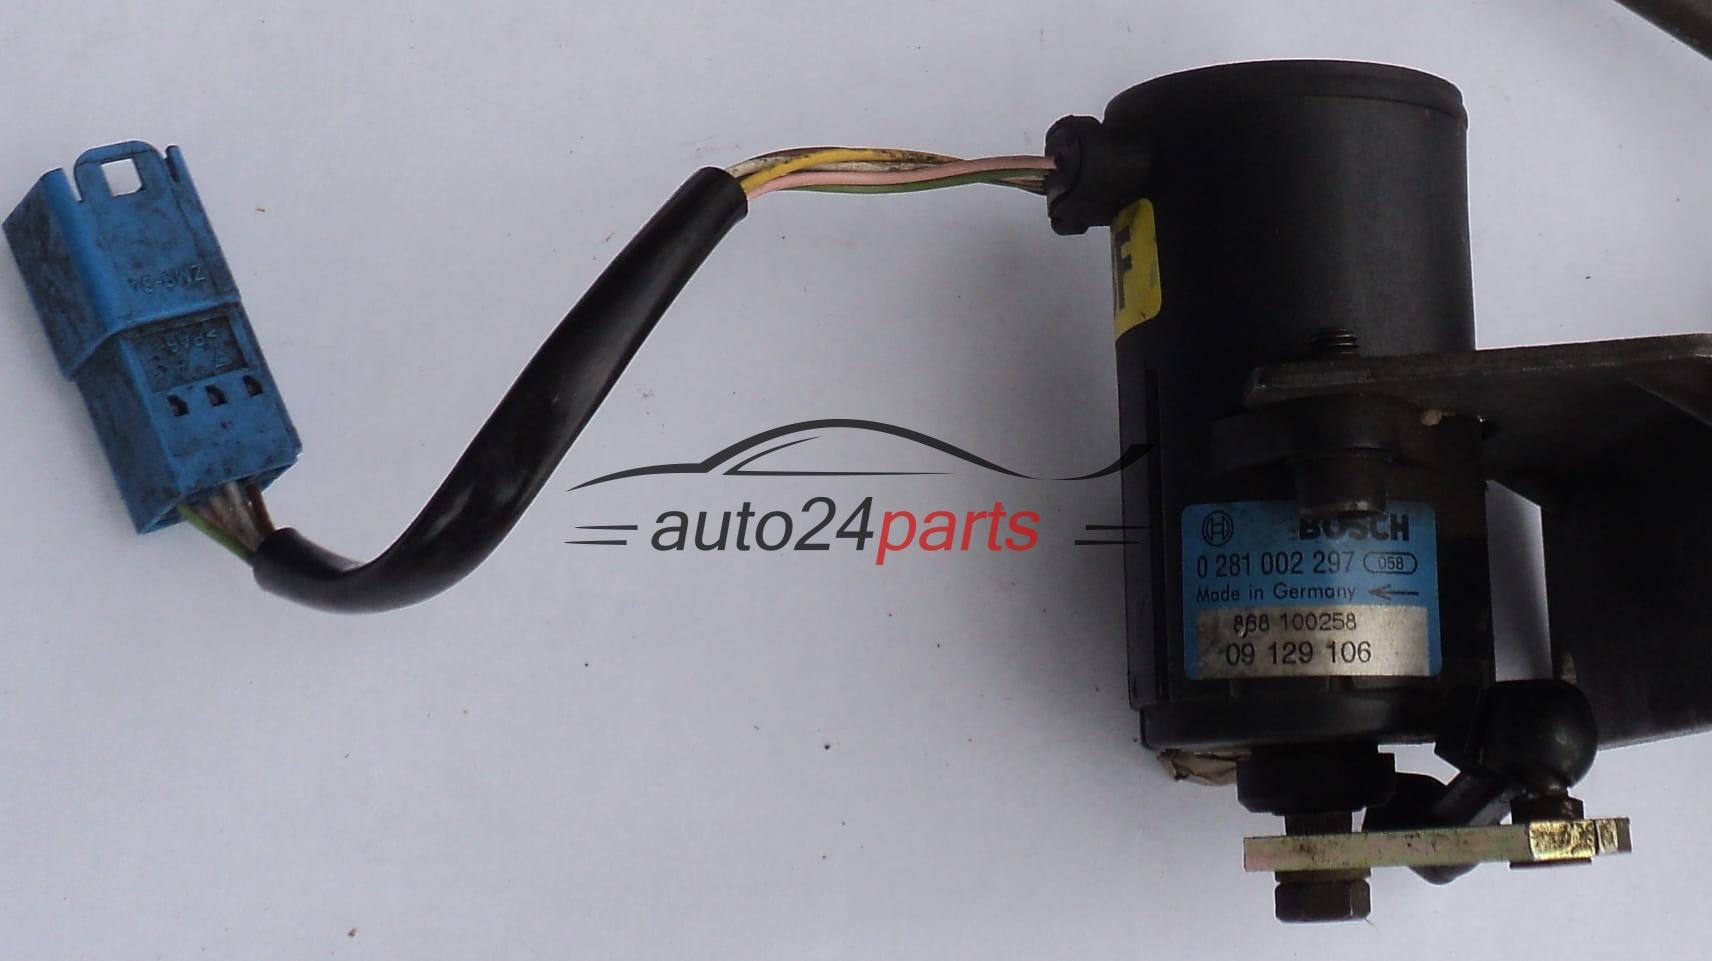 Auto Teile Gaspedal Potentiometr Elektrisch Gas Pedal Opel Omega Vectra 2 0 2 2 Dti X20dtl